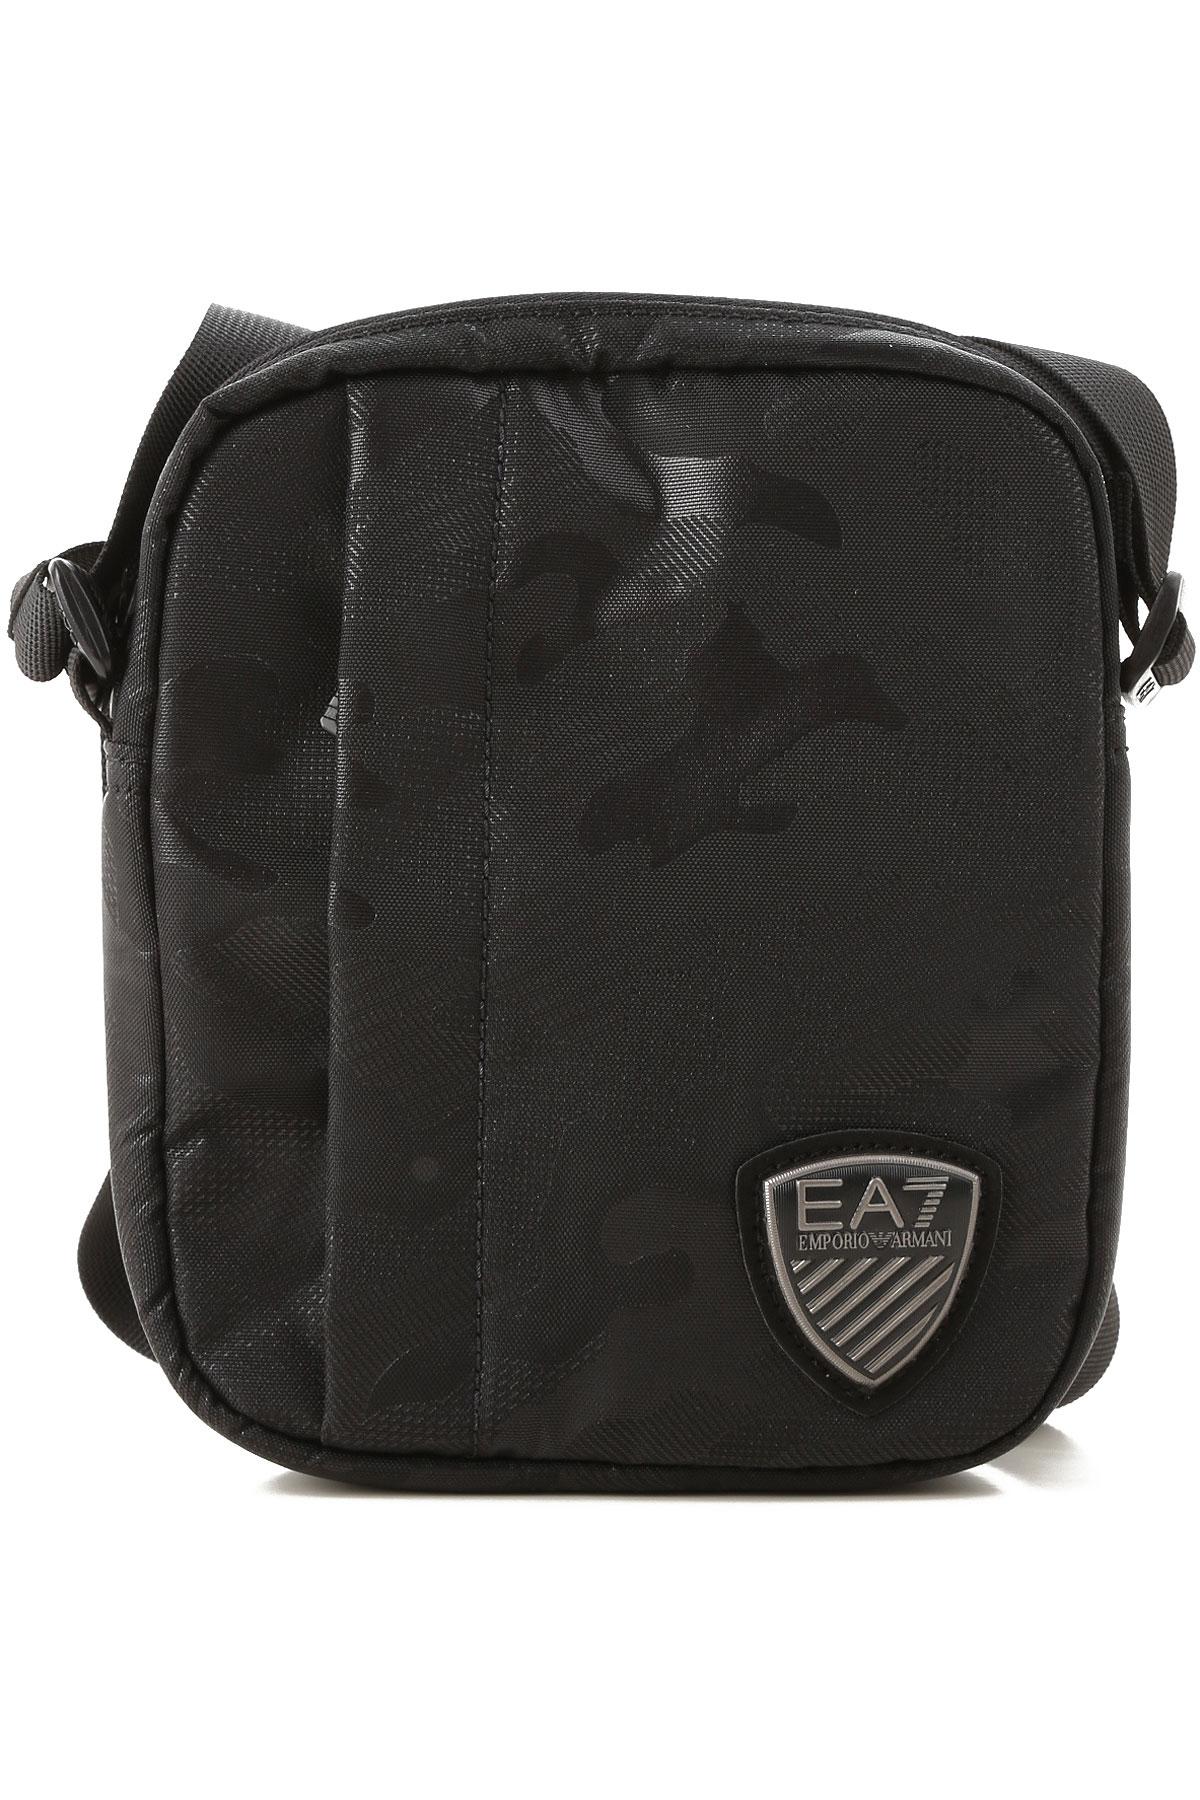 Image of Emporio Armani Messenger Bag for Men, Camouflage Black, polyamide, 2017